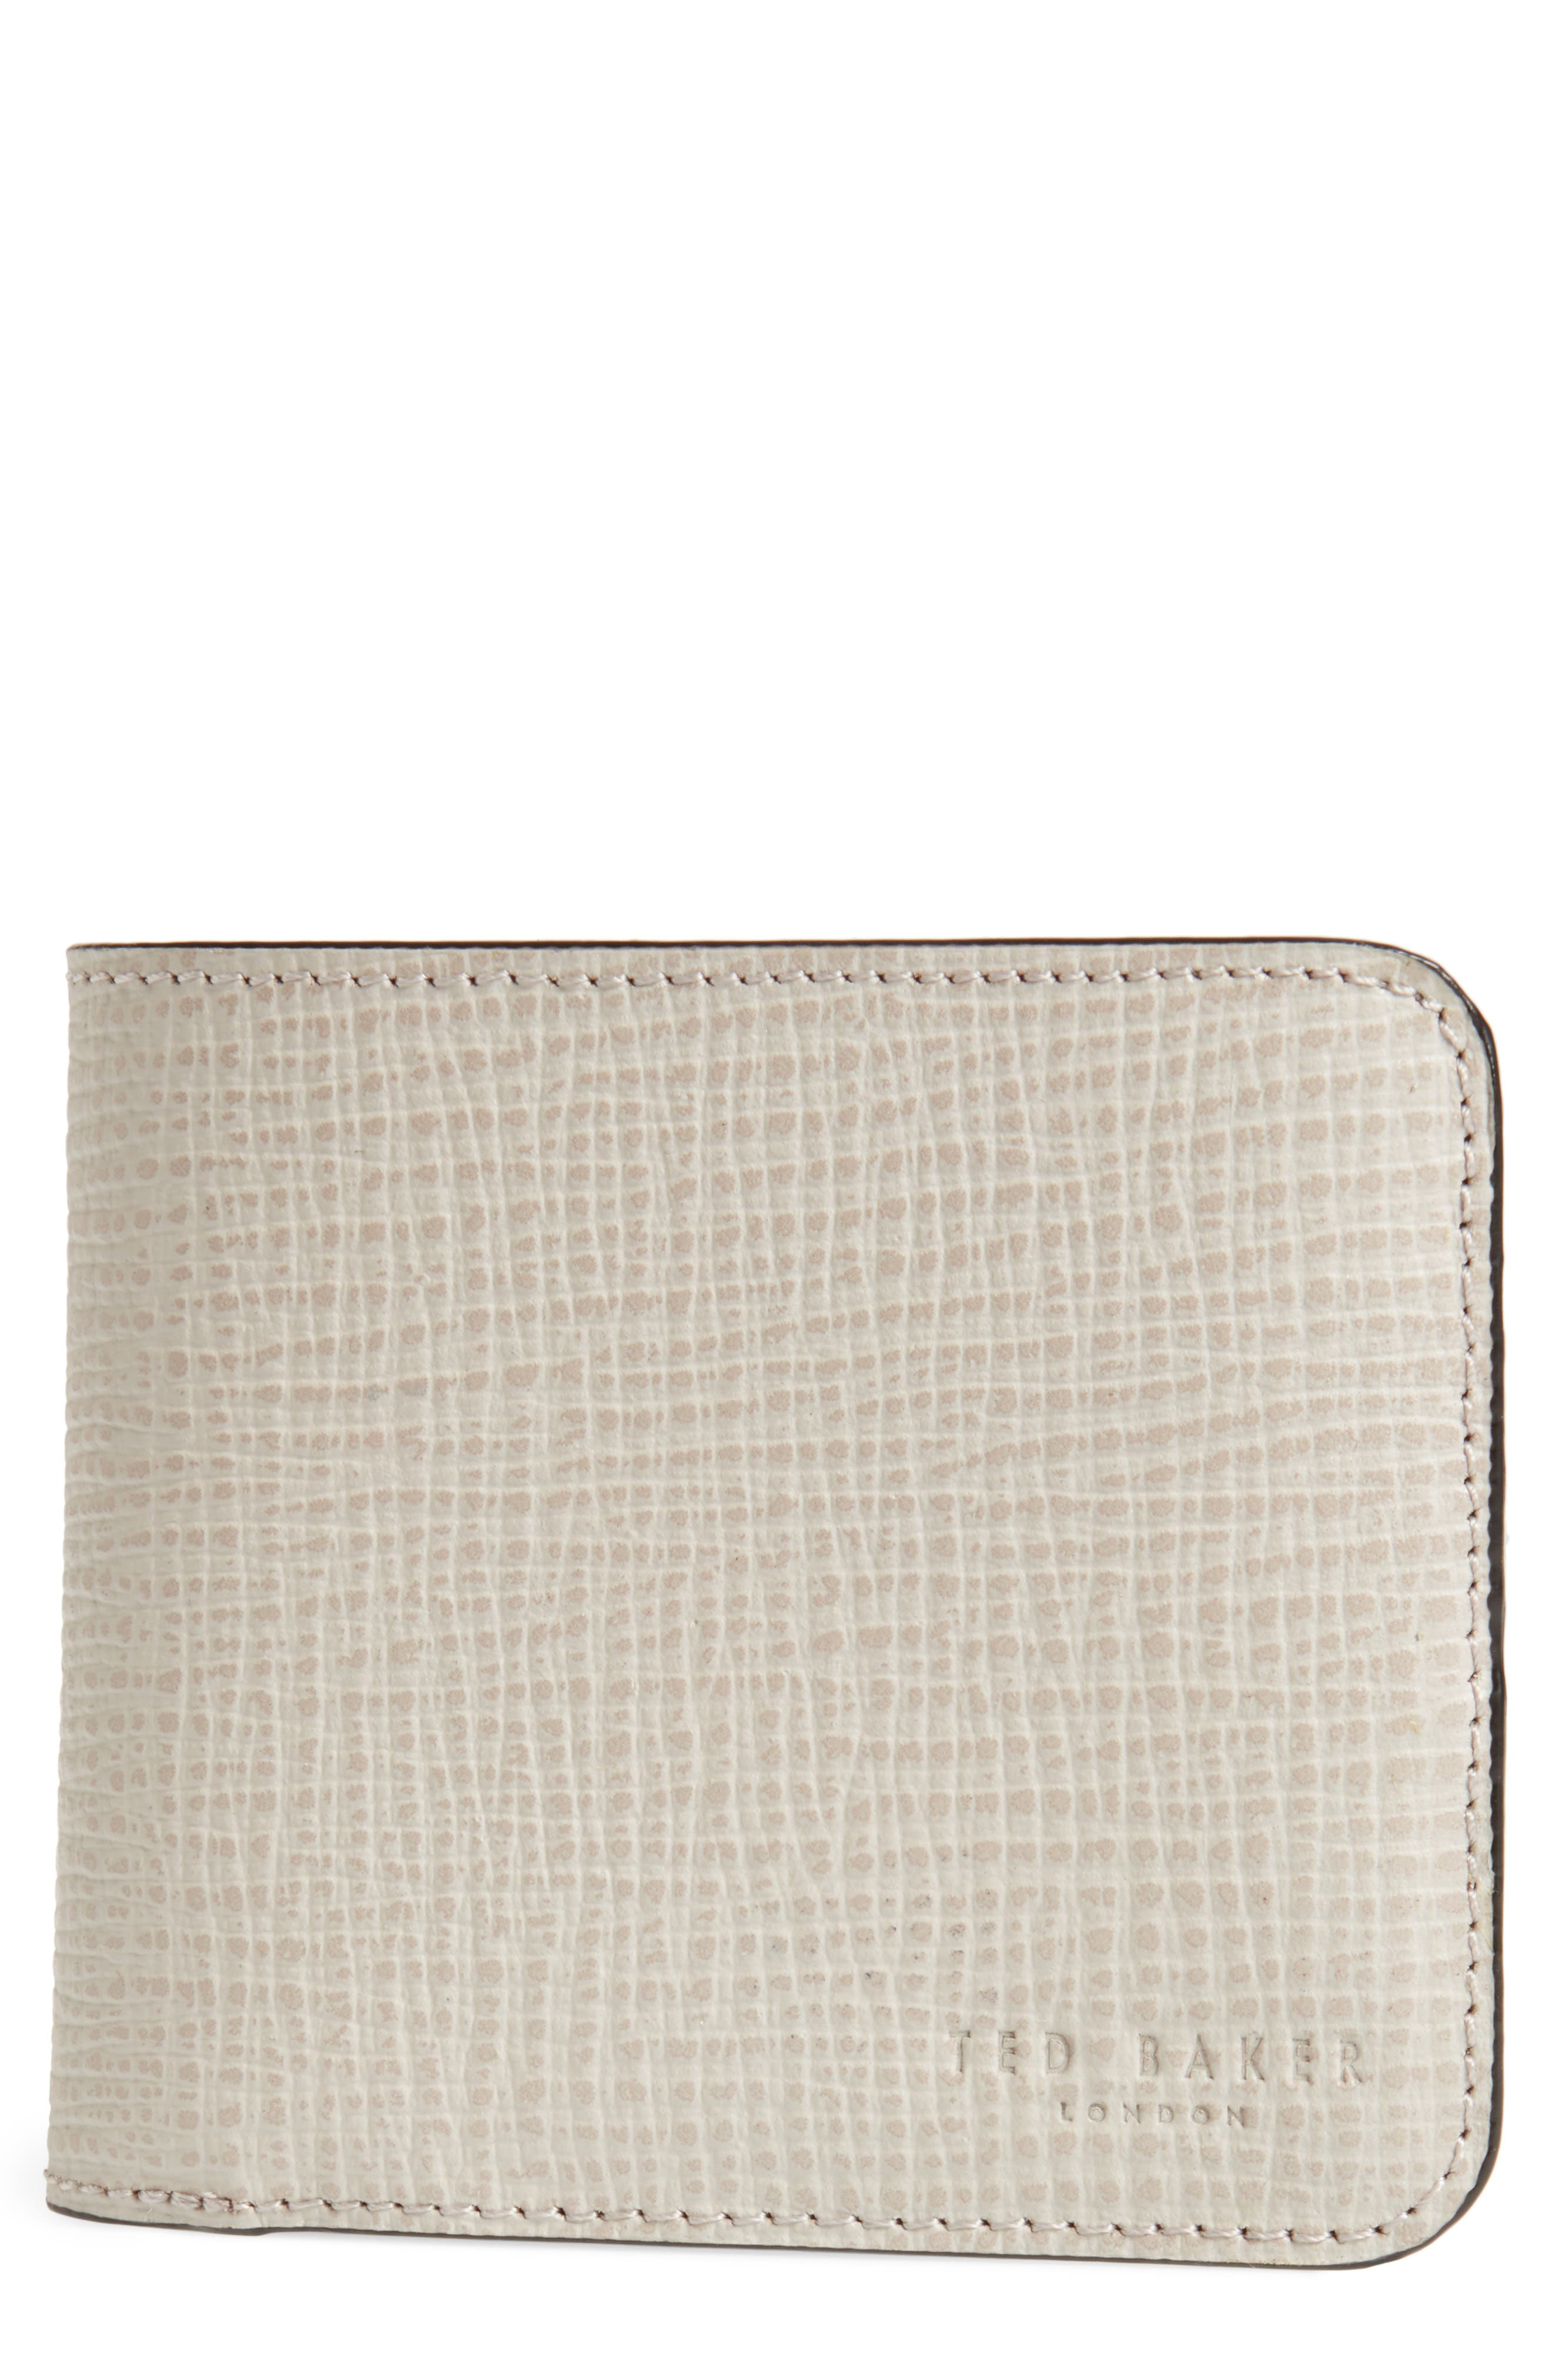 Astridd Palmelato Leather Wallet,                         Main,                         color, 200